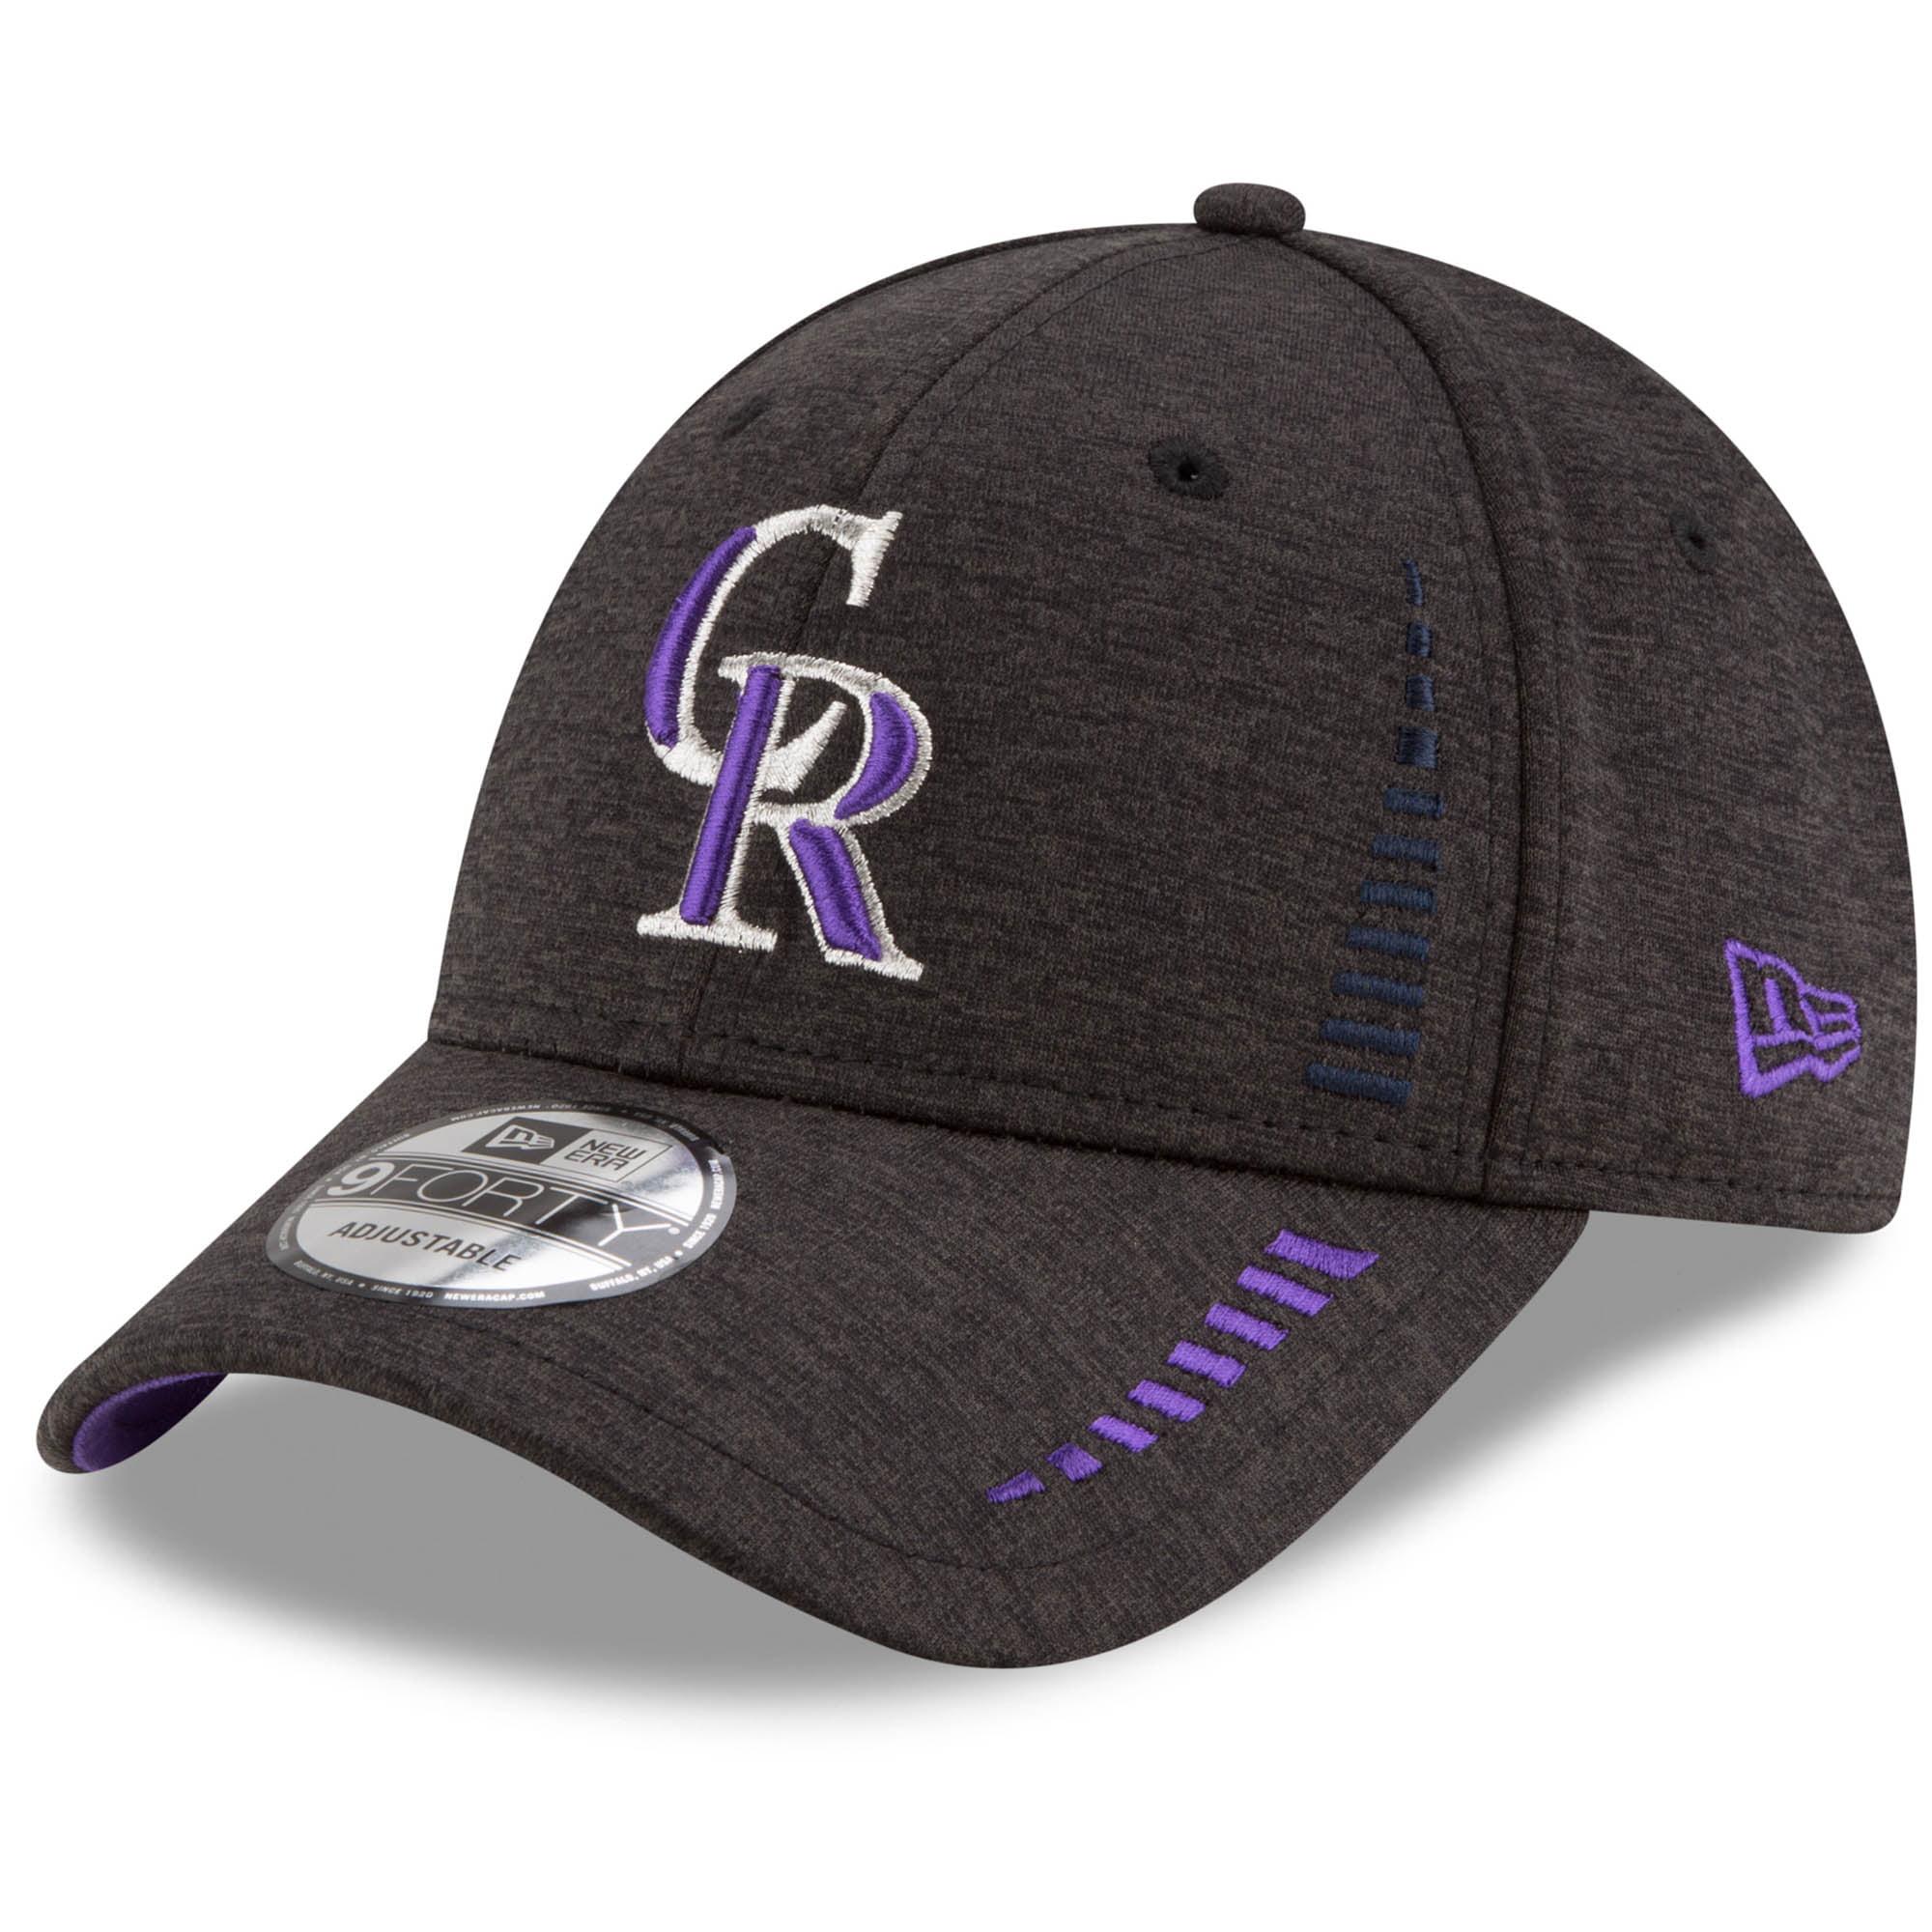 Colorado Rockies New Era Speed Shadow Tech 9FORTY Adjustable Hat - Black - OSFA